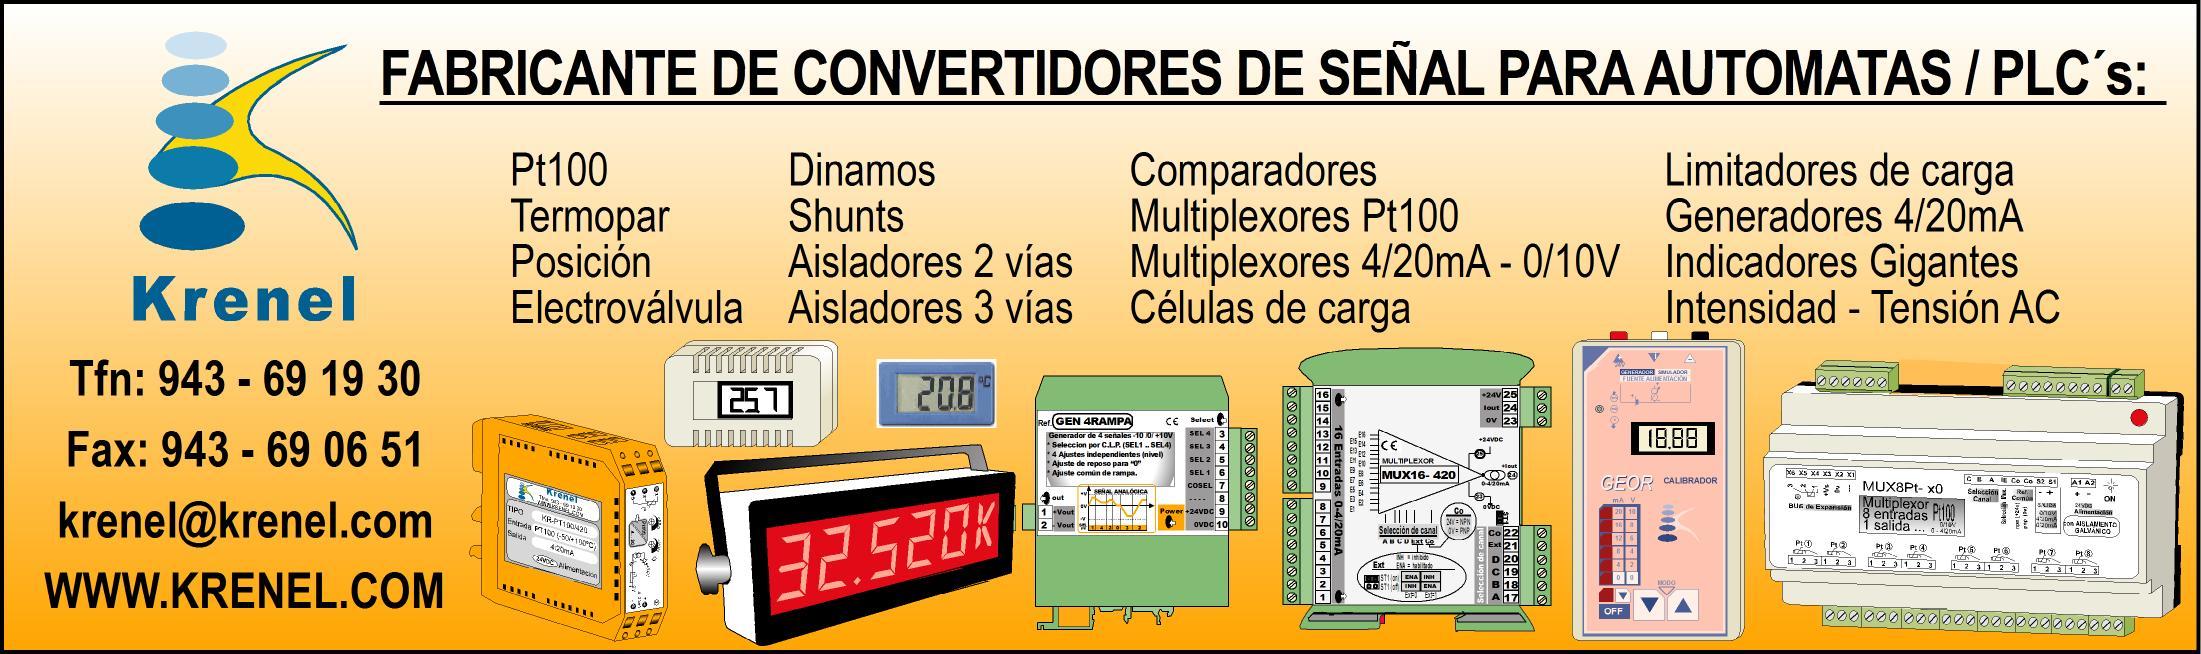 fabricante de convertidores de señal